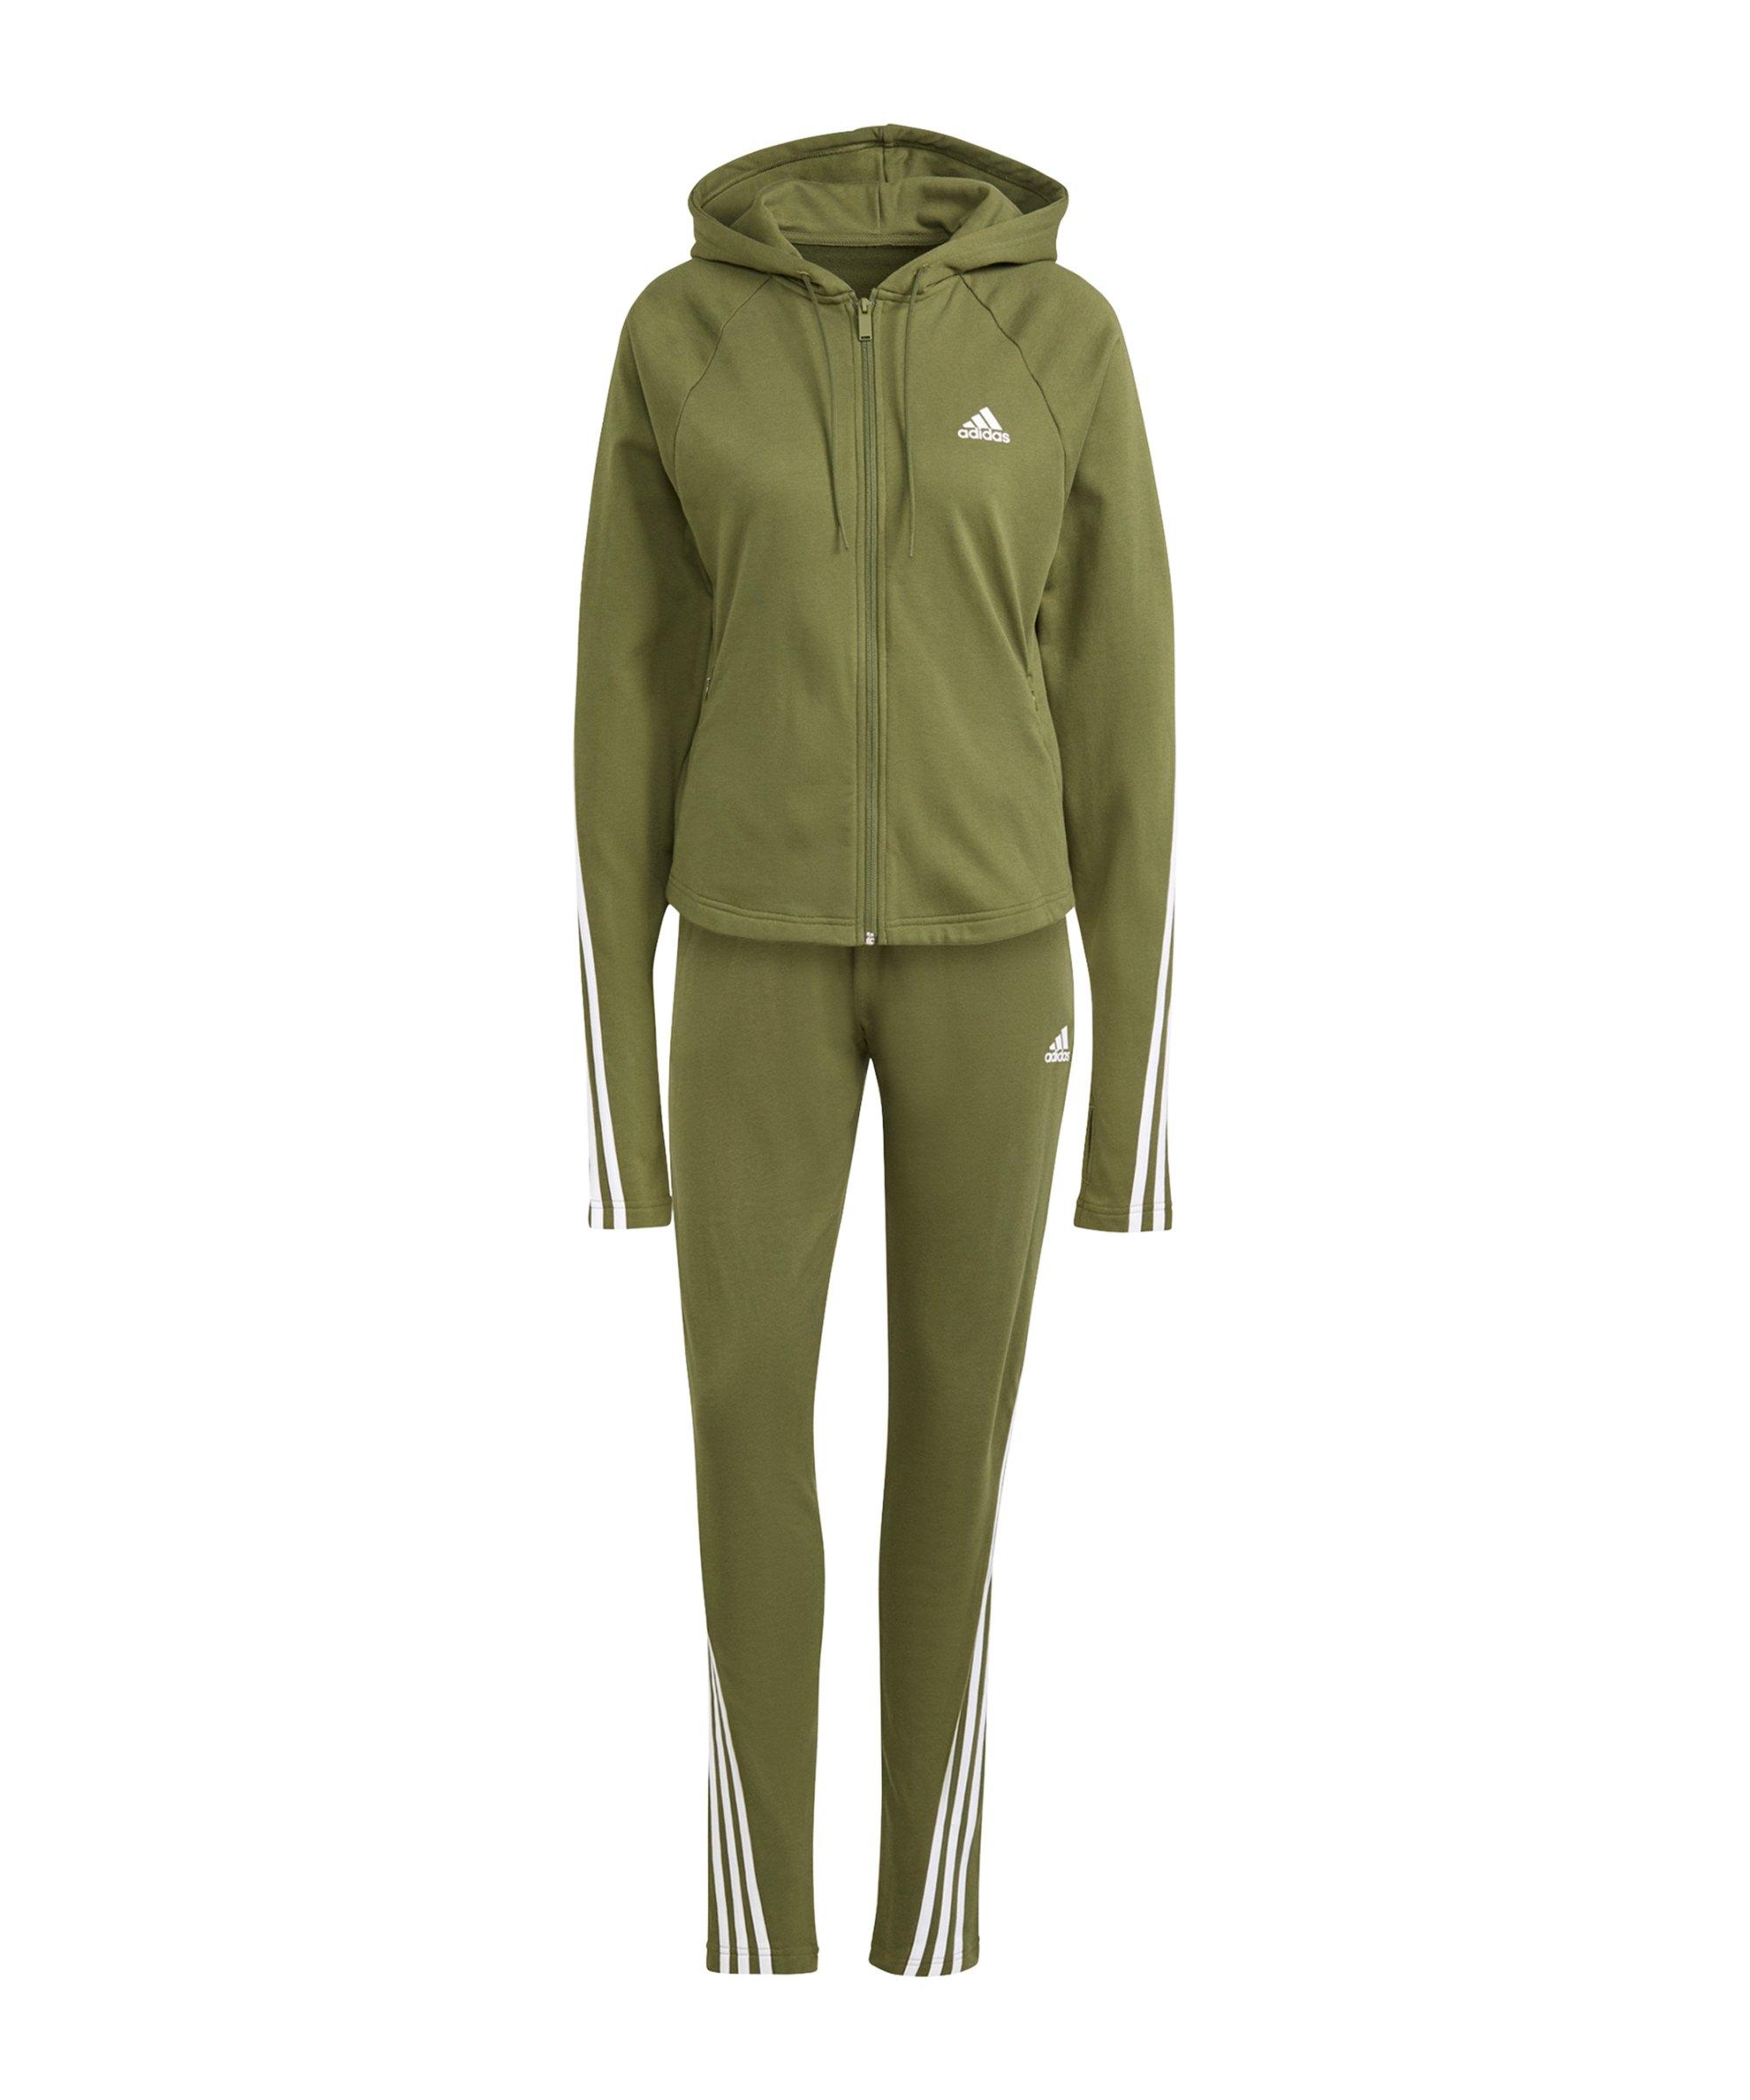 adidas Slim Fit Trainingsanzug Damen Grün - gruen